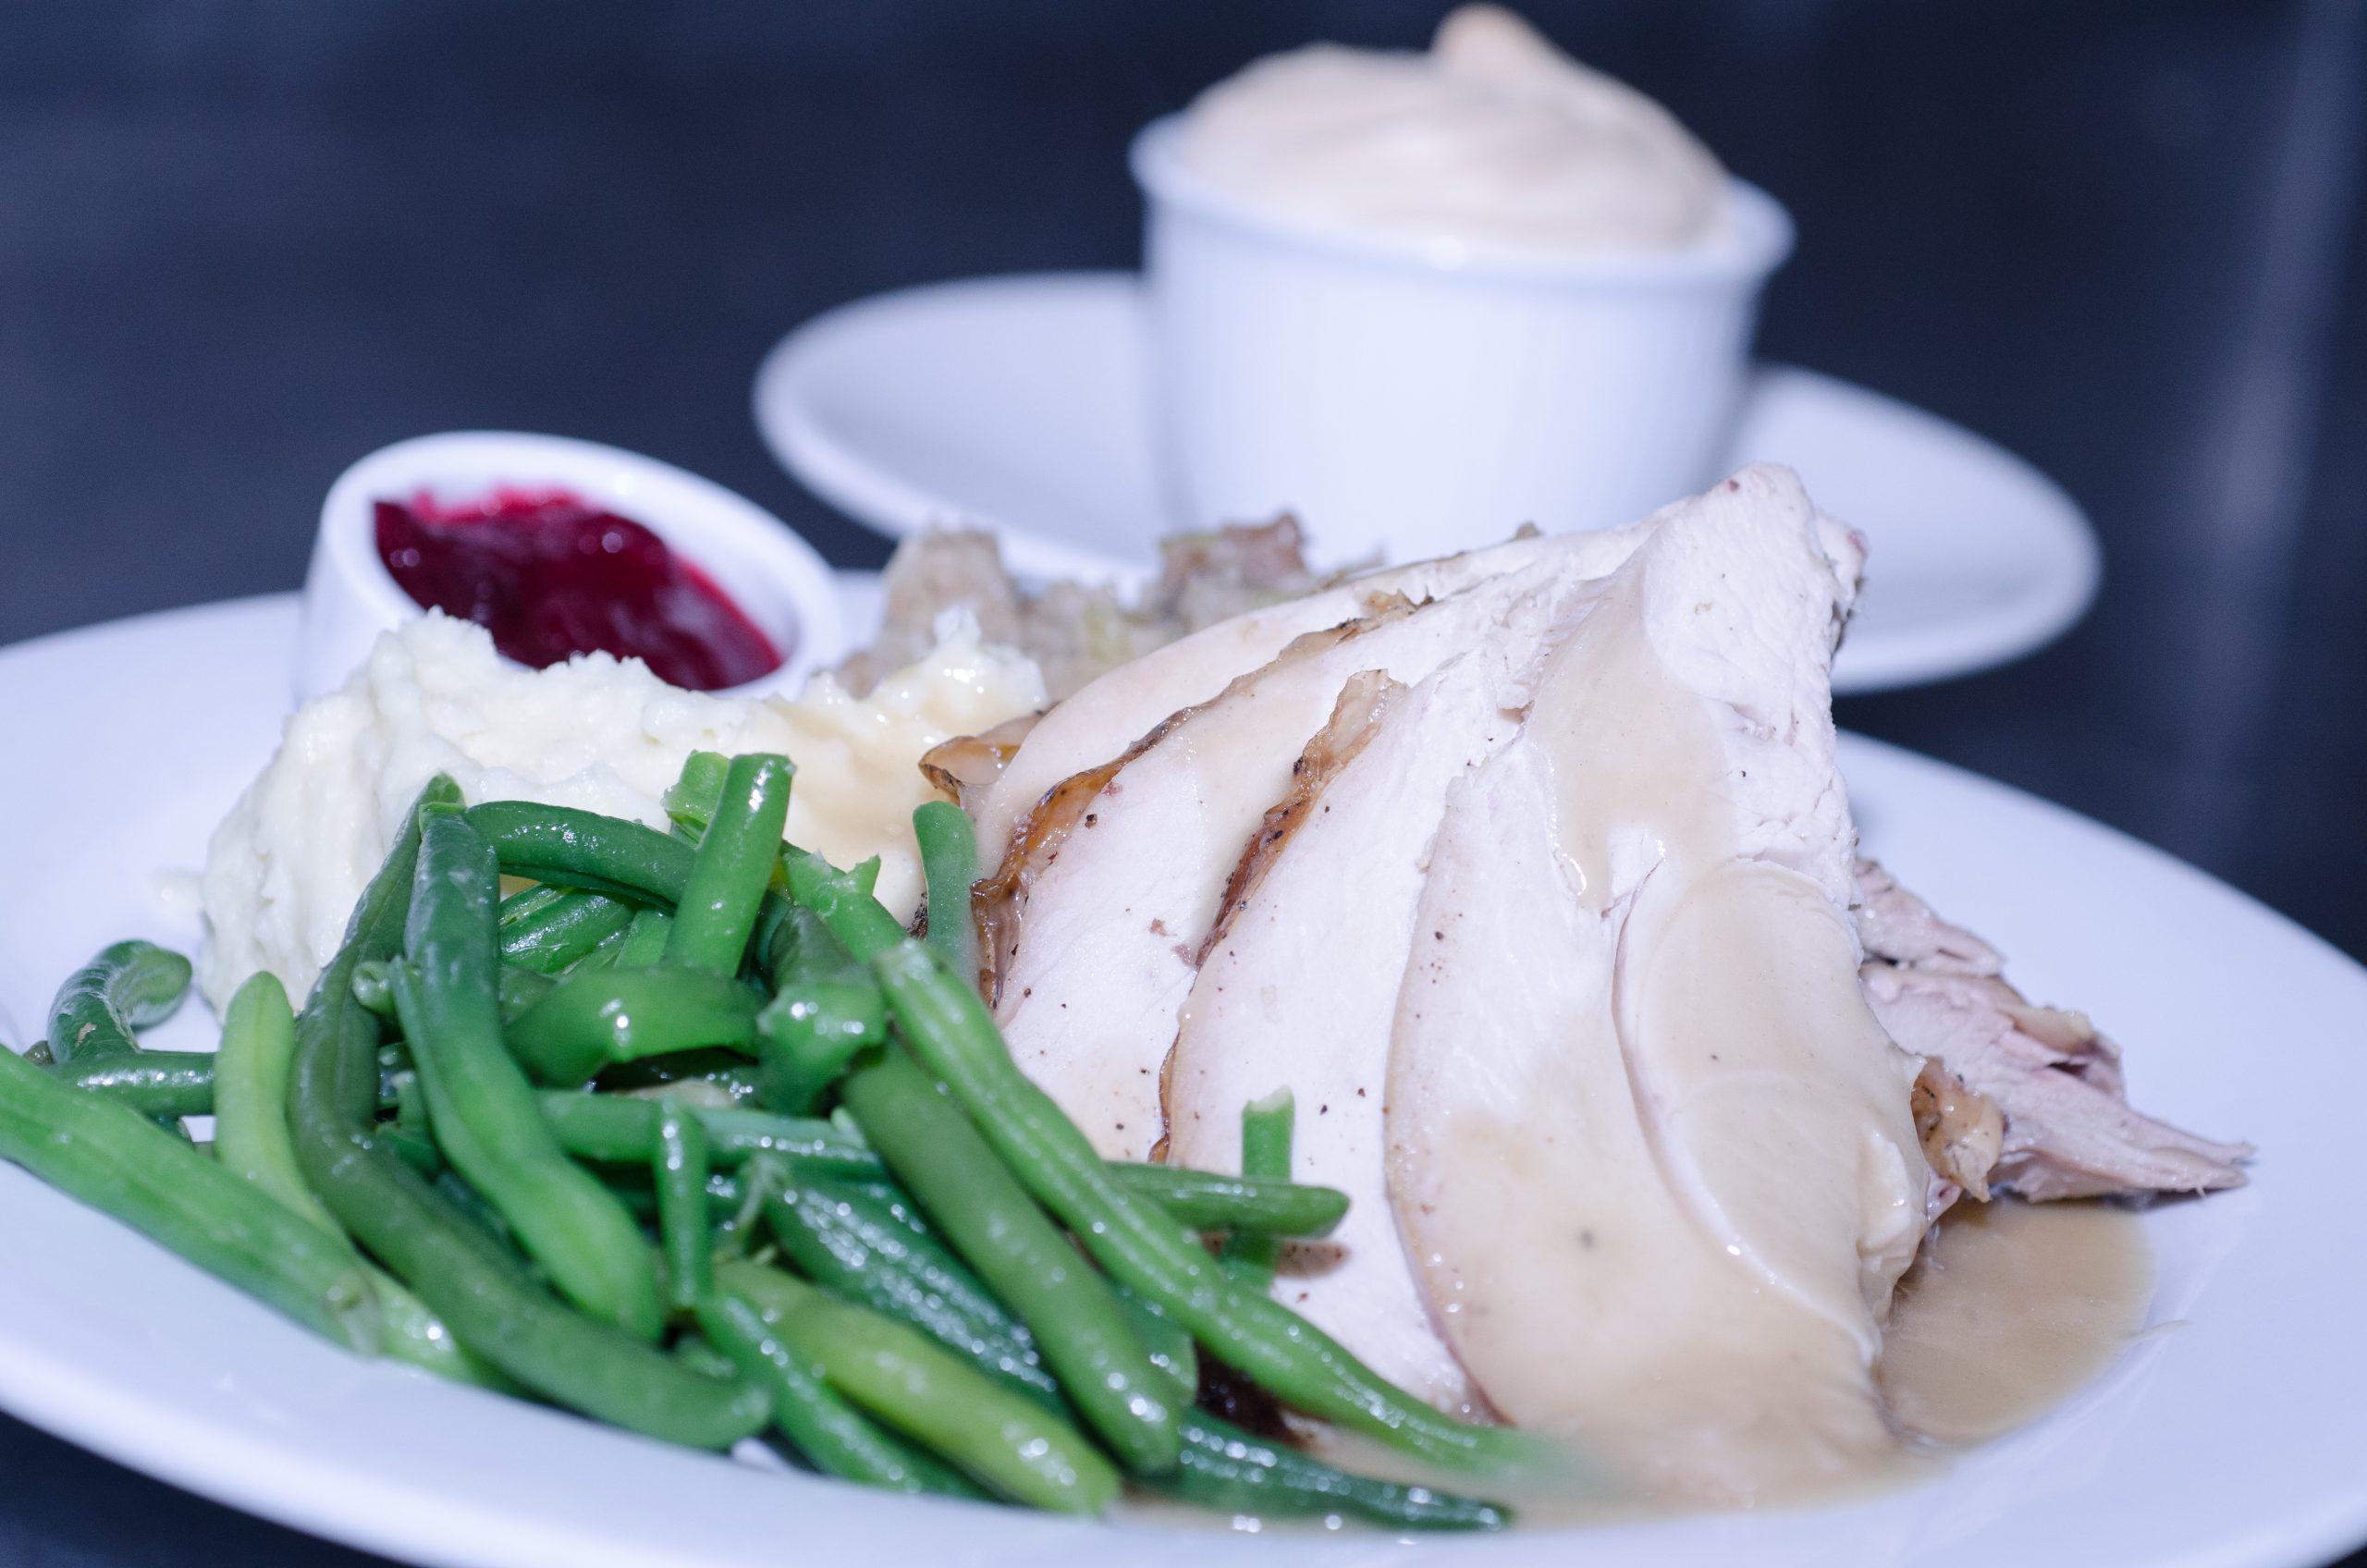 Prairie Grass Cafe Thanksgiving Dinner